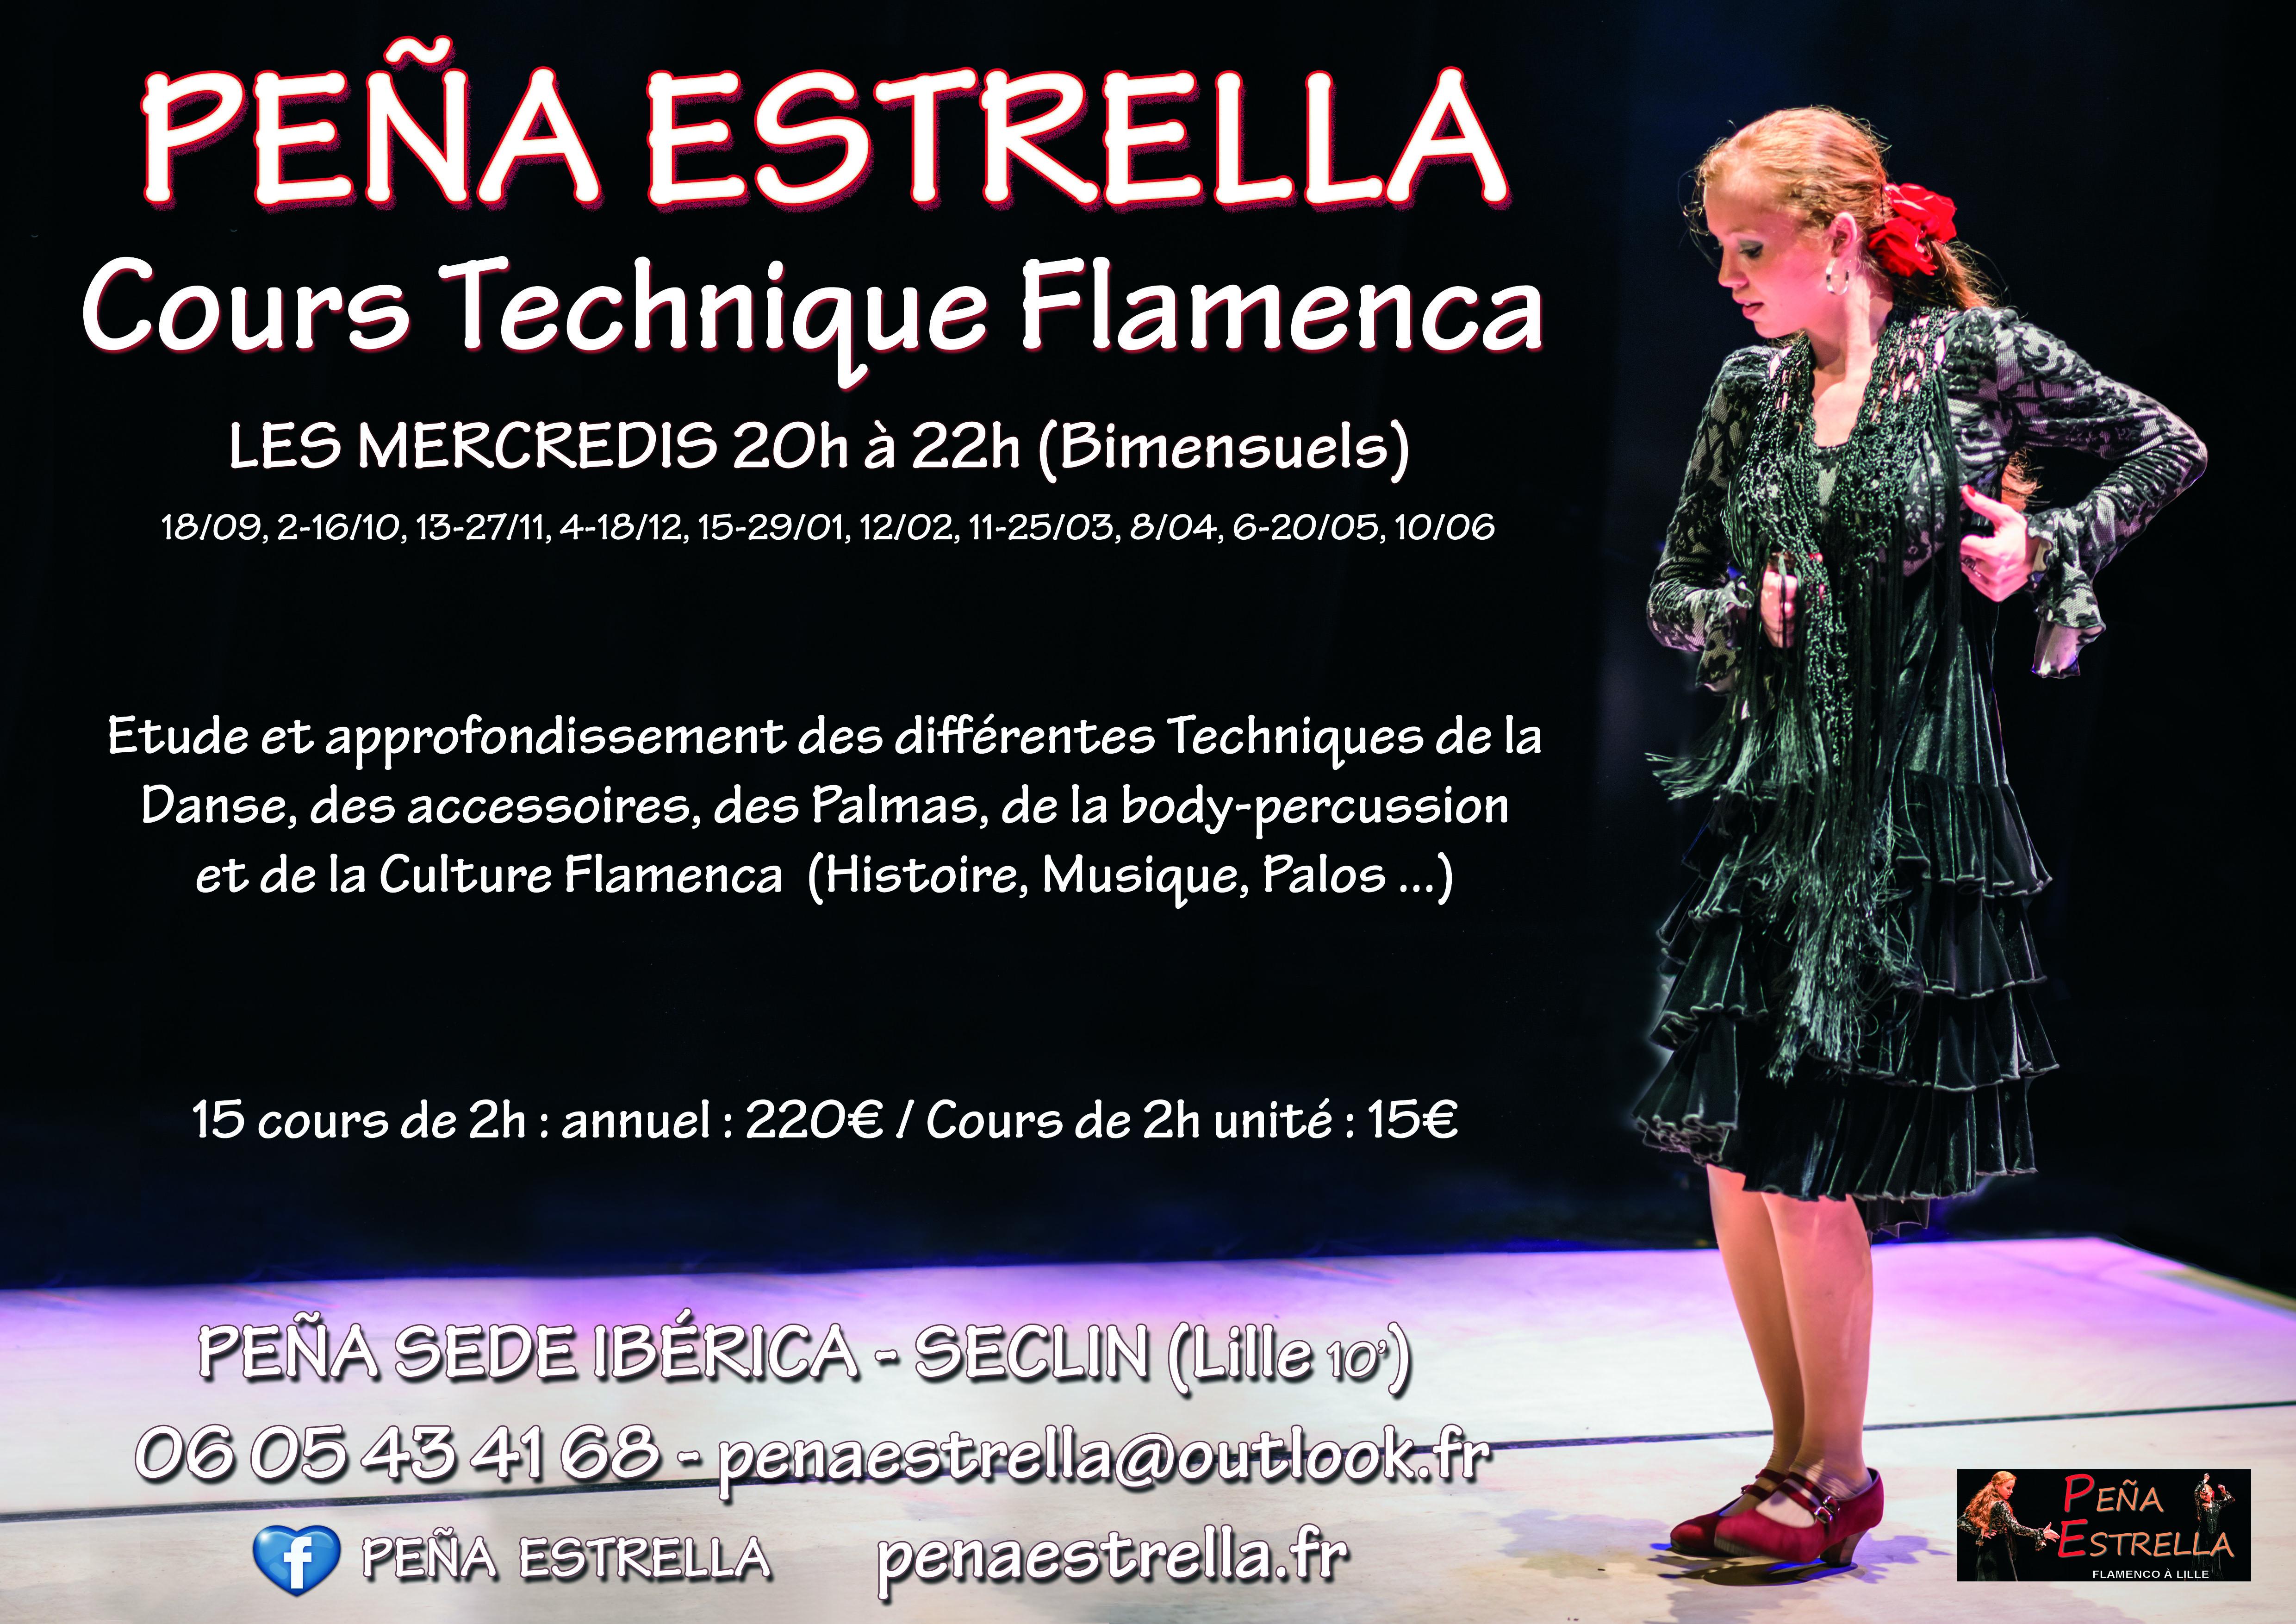 Flamenco Technique Lille Seclin Nord pas de Calais Picardie Hauts de France Peña Estrella